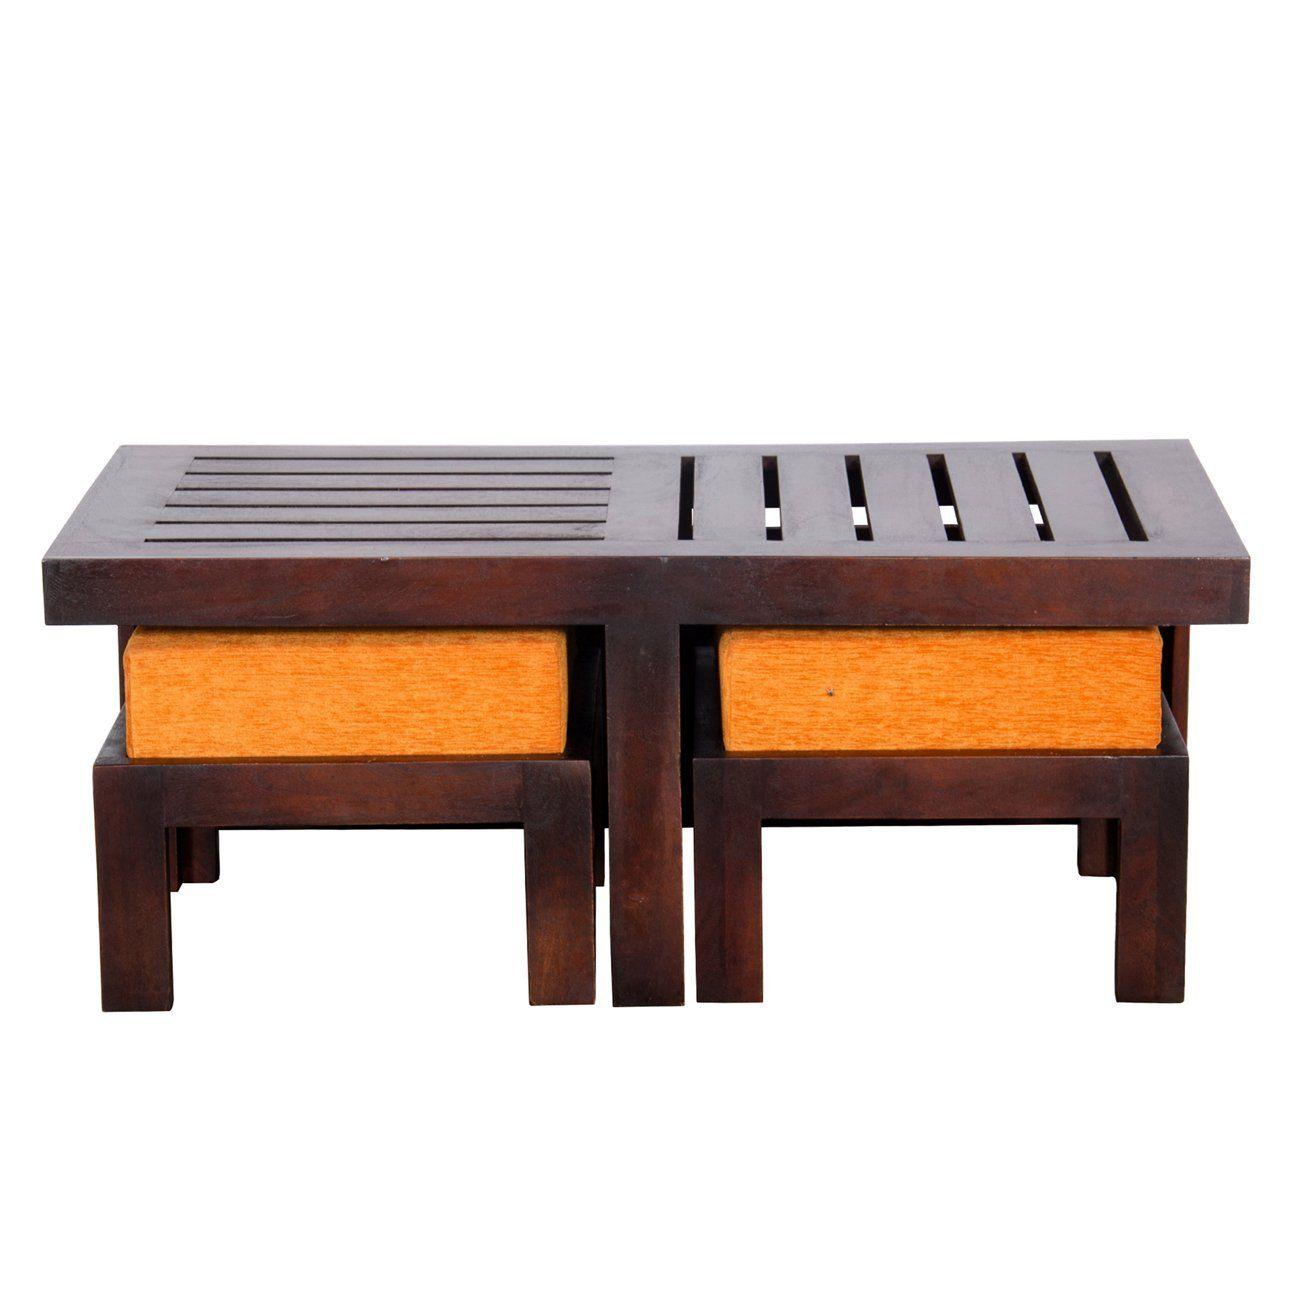 Altavista perk solid wood coffee table brownr details and